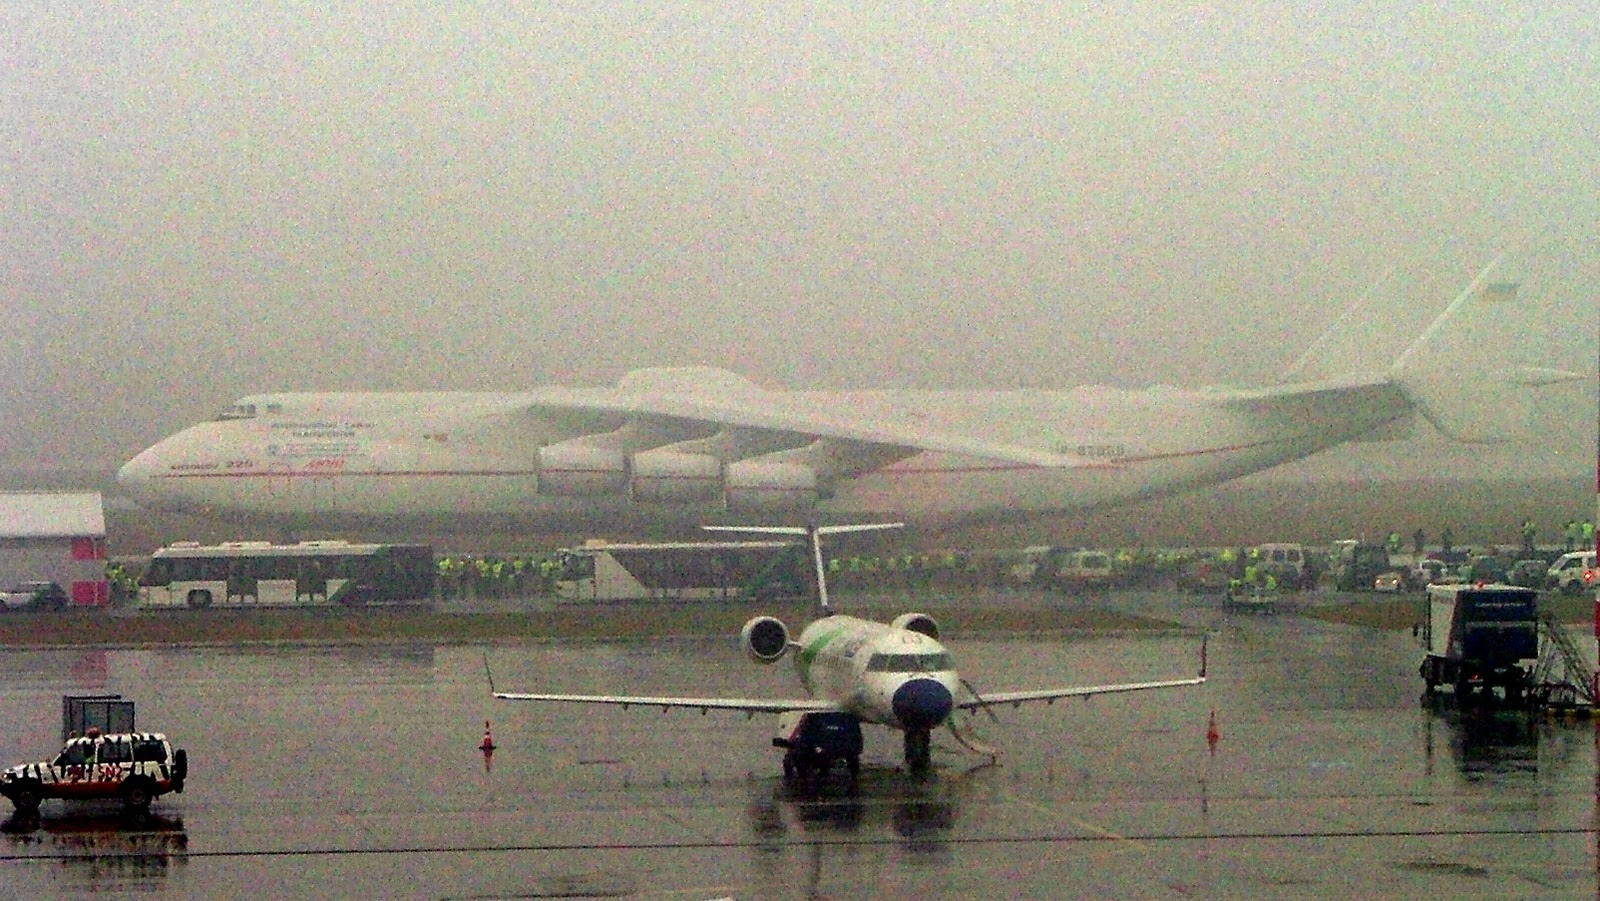 http://4.bp.blogspot.com/-9UgQ72cNsHA/TZCgMXu2_RI/AAAAAAAAFJo/vMsfAVW-5bs/s1600/an225+largest+aircraft+ever+2.jpg